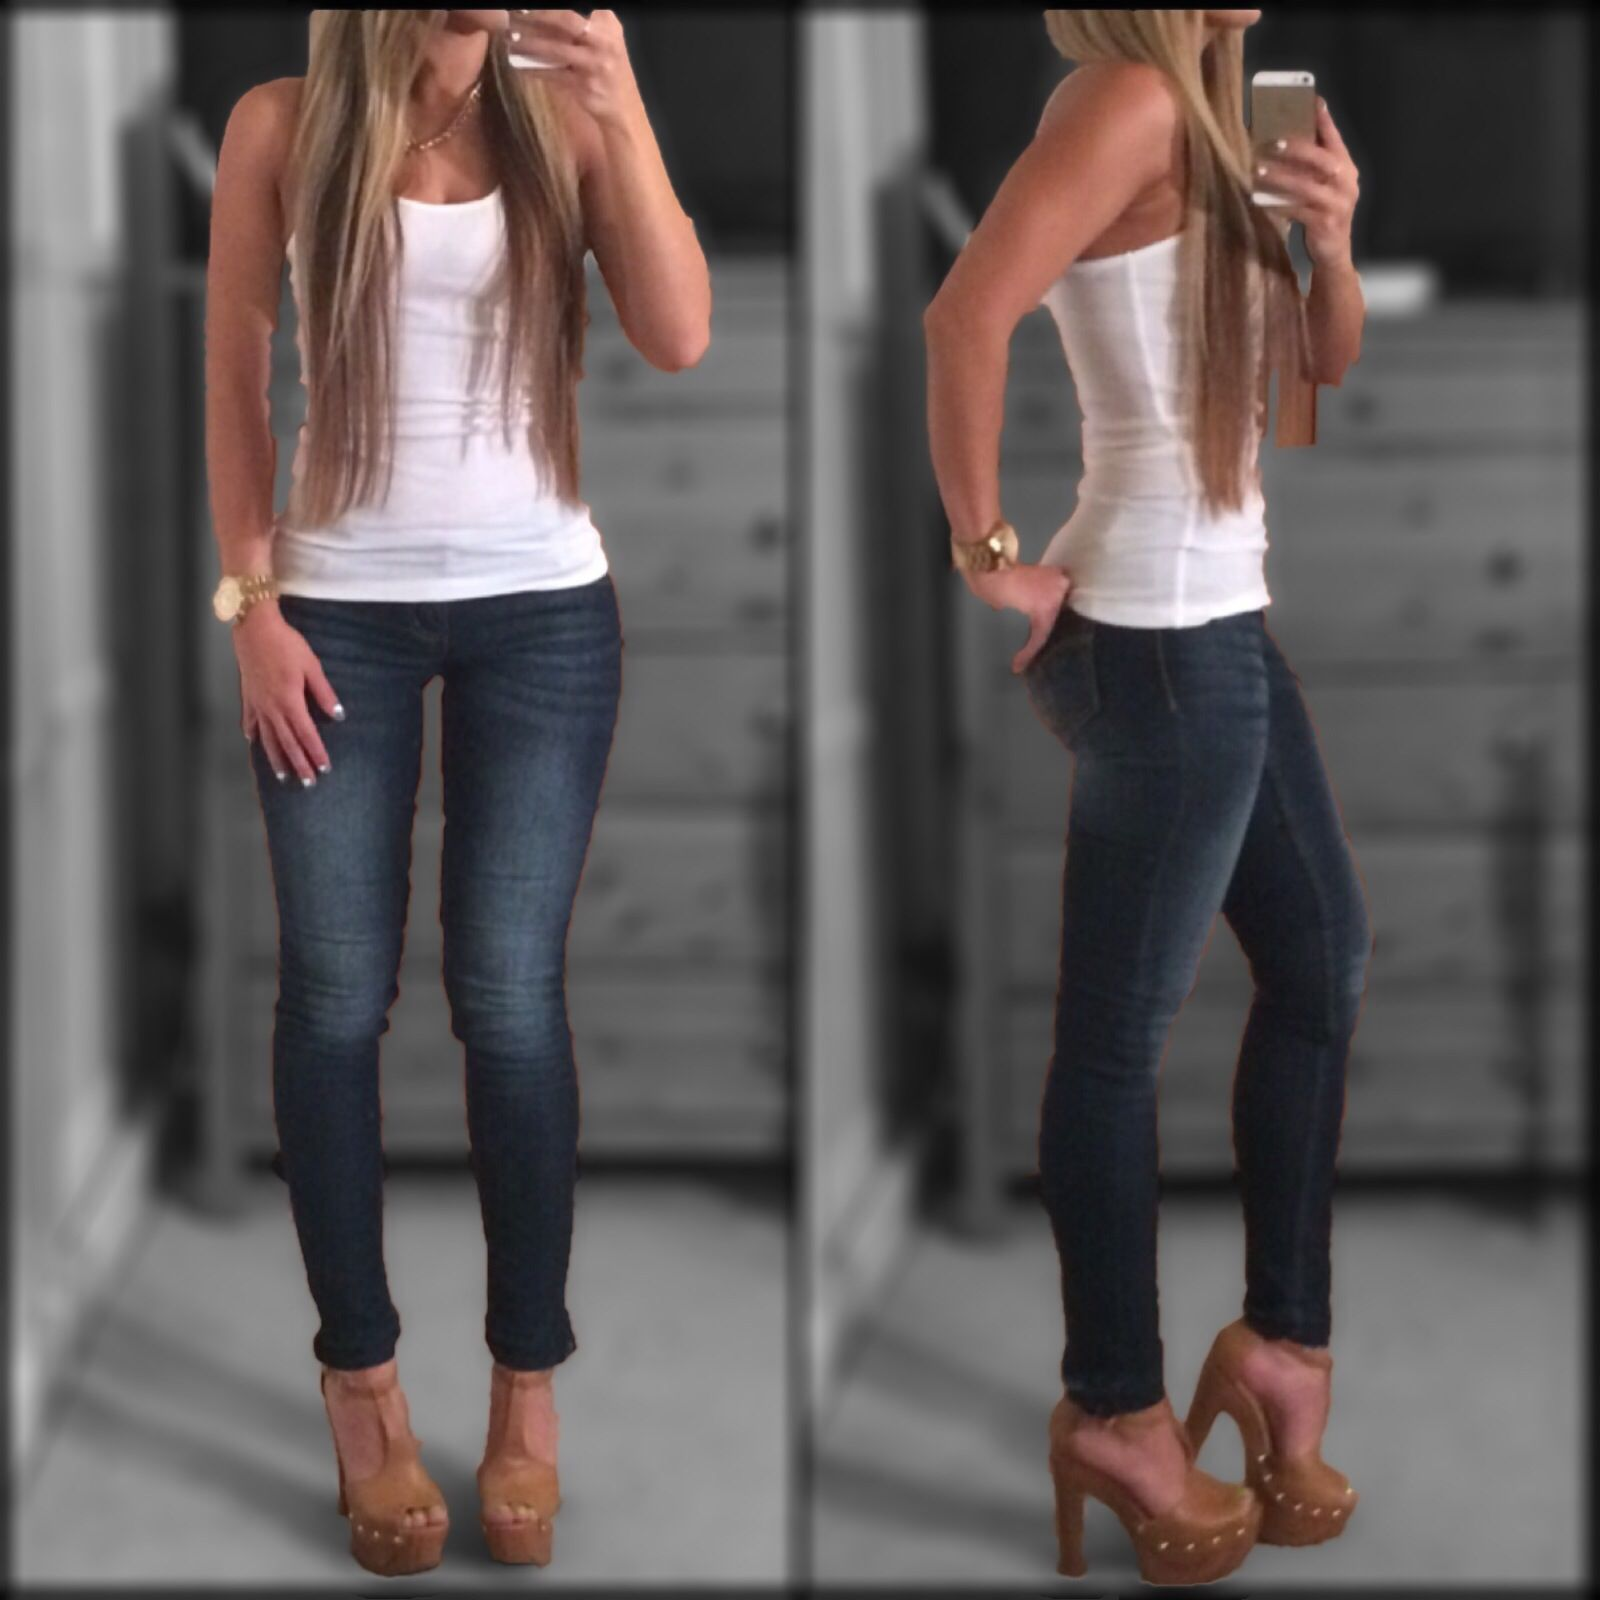 Skinny jeans white tank top